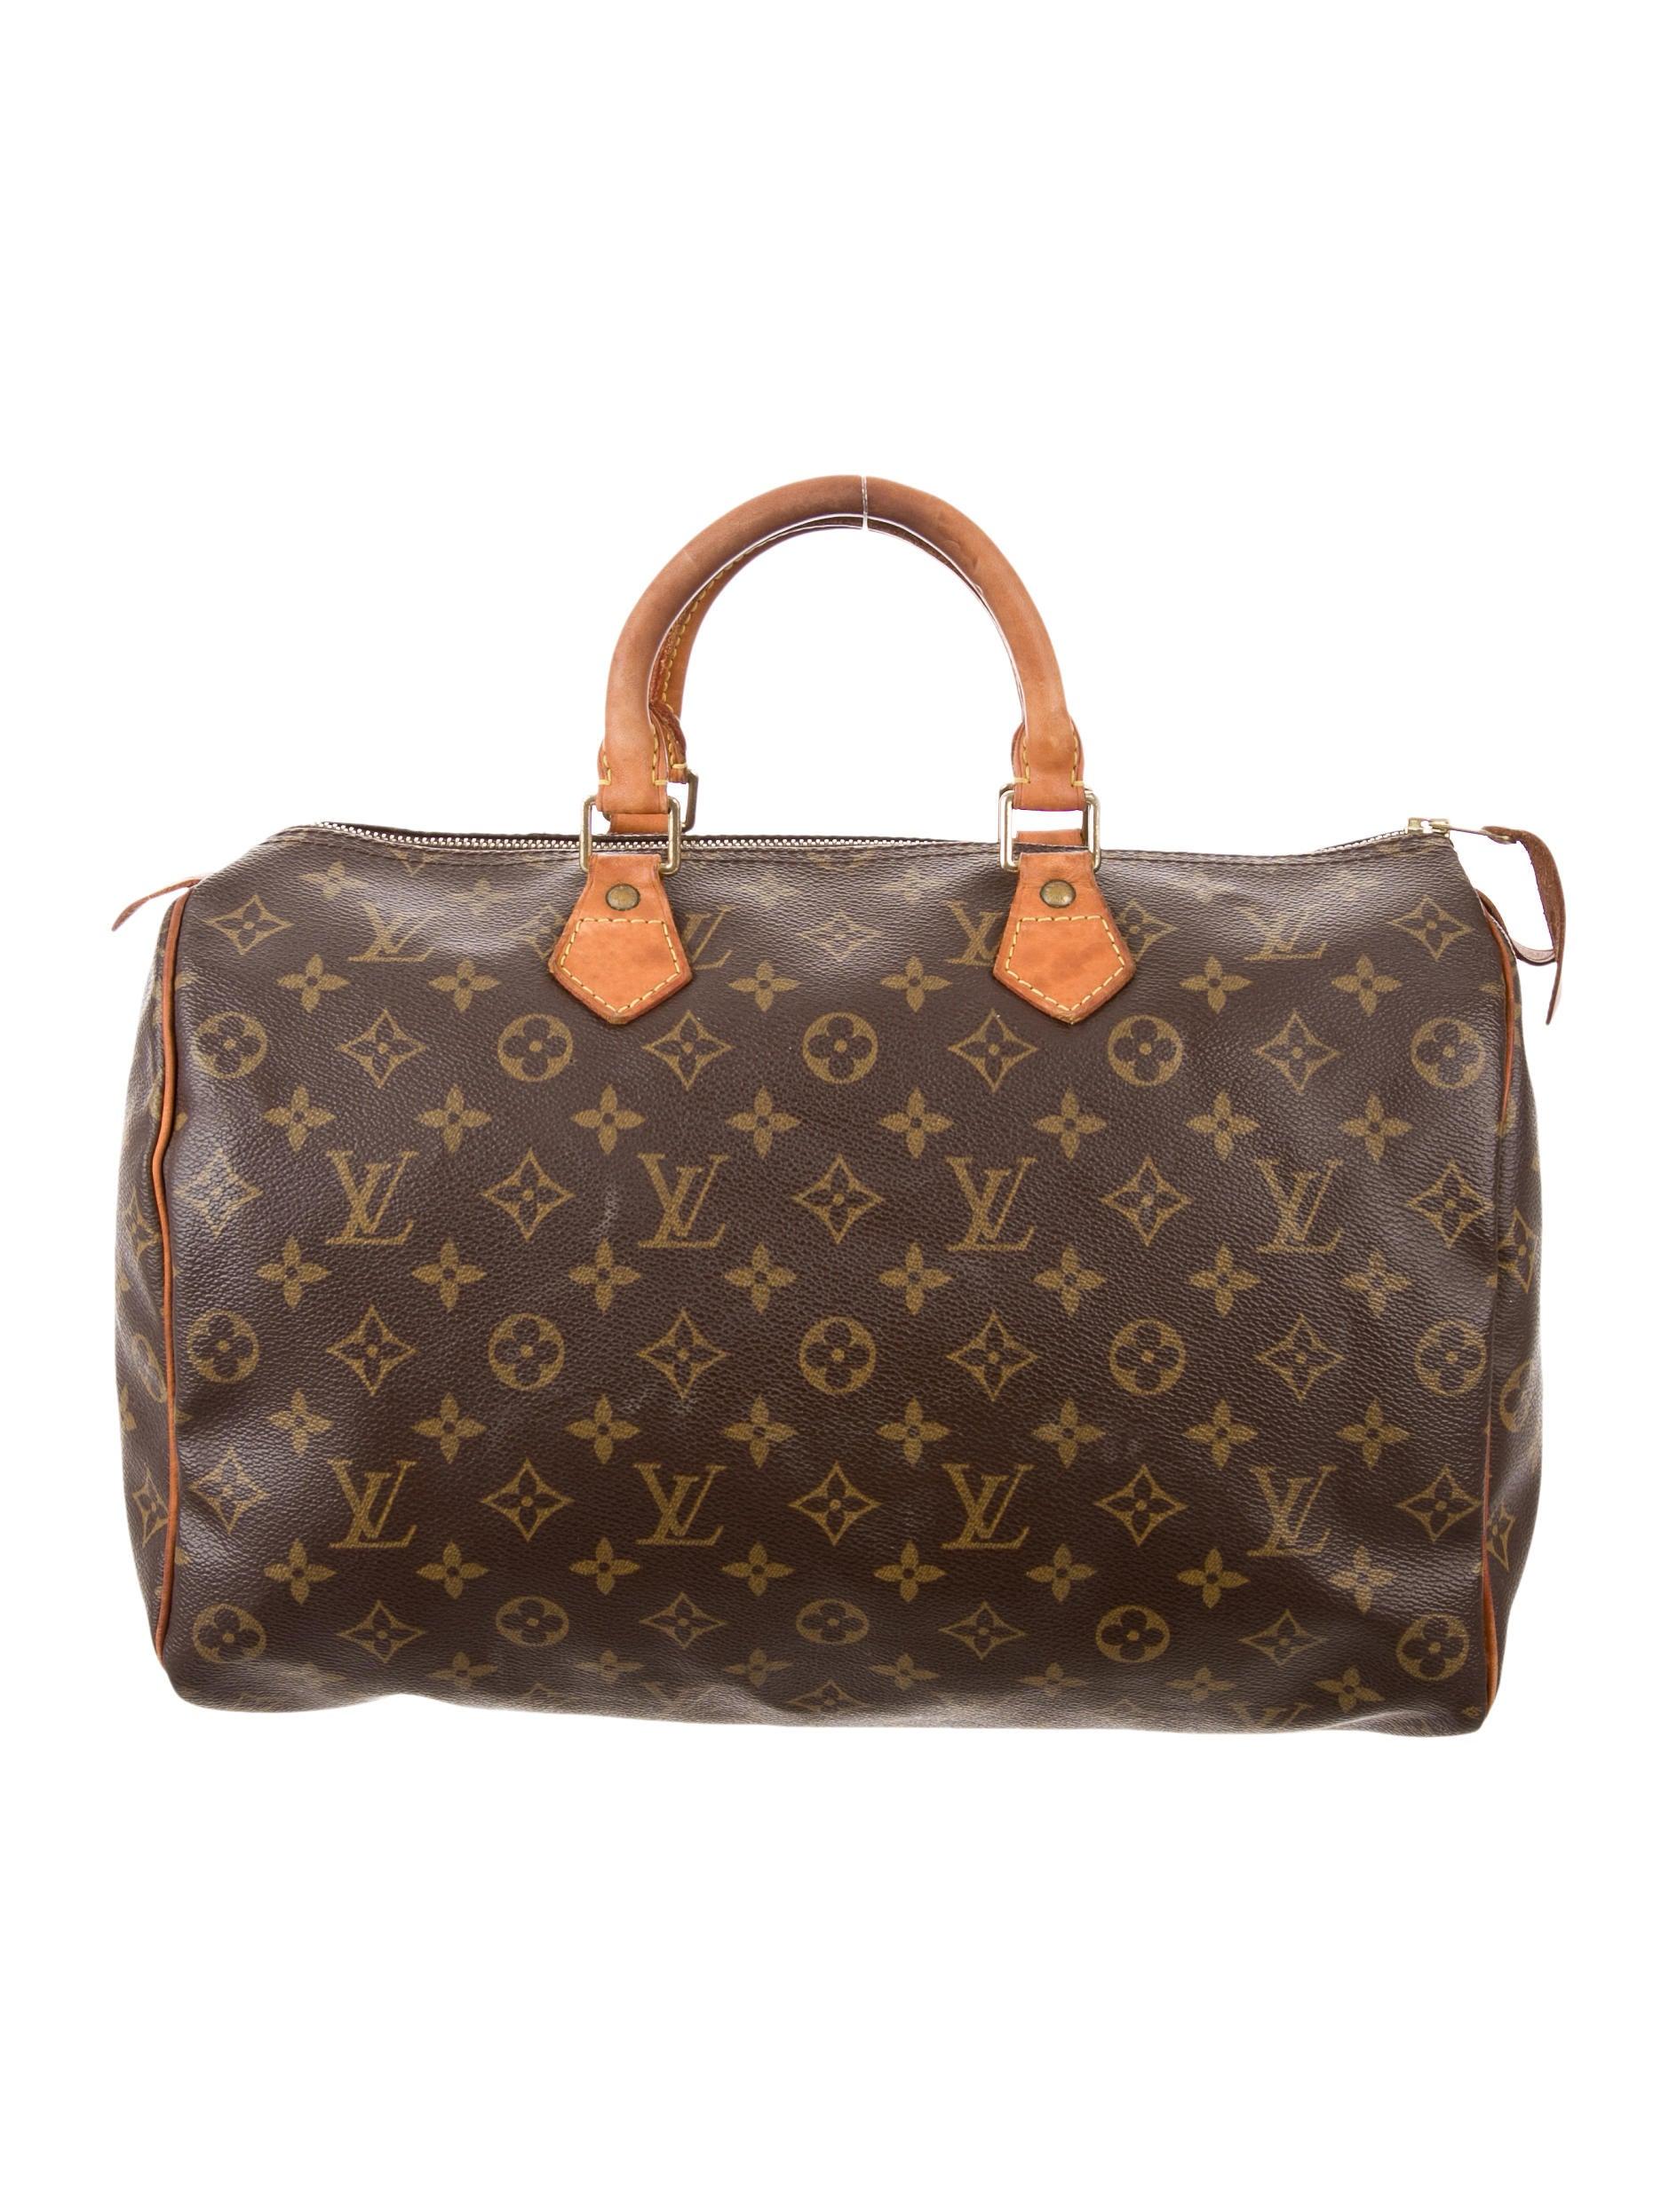 Louis vuitton monogram speedy 35 handbags lou125057 for Louis vuitton miroir speedy 35